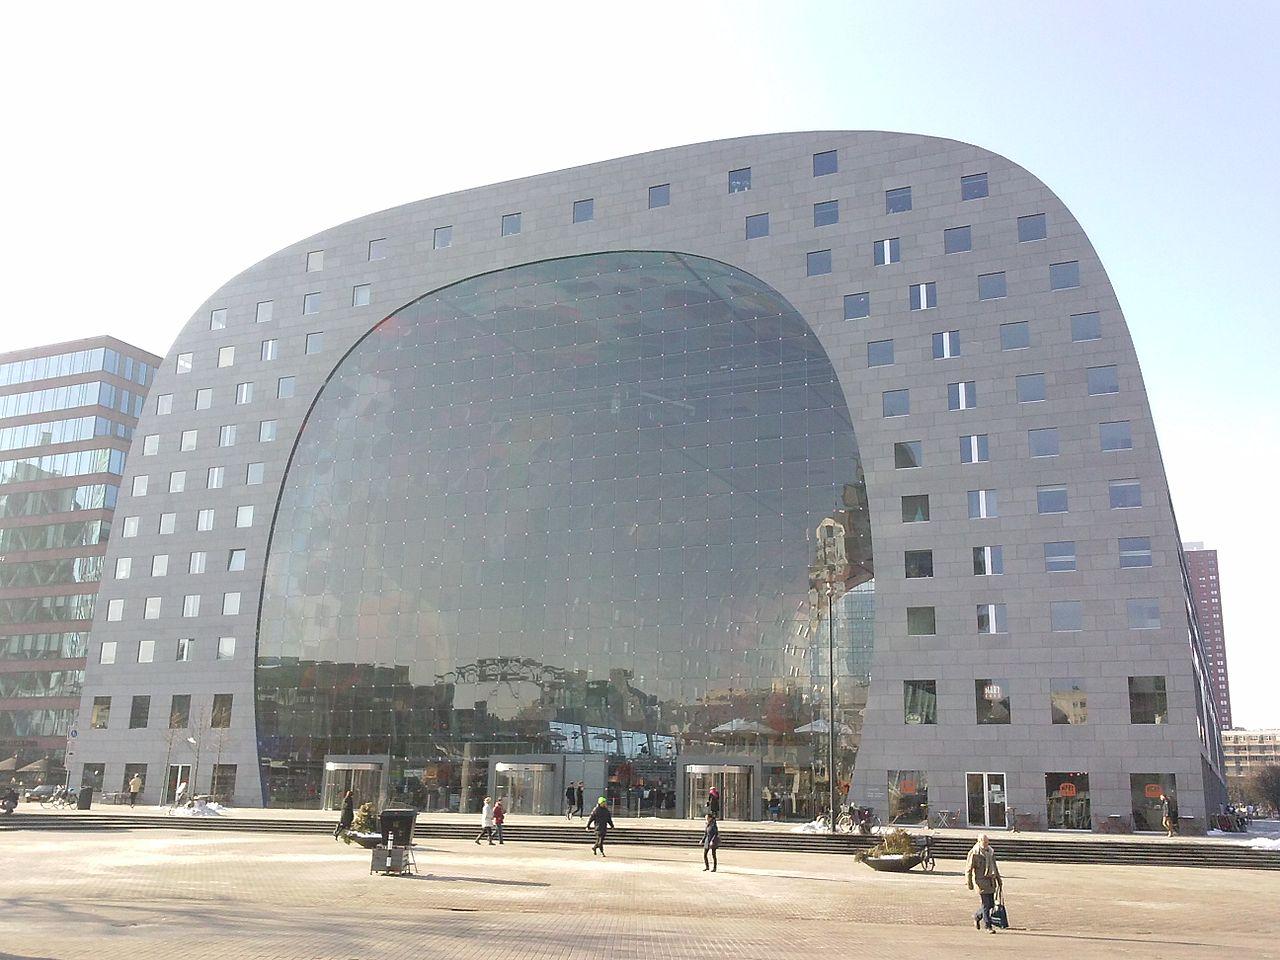 https://upload.wikimedia.org/wikipedia/commons/thumb/d/df/Markthal_Rotterdam_2015.jpg/1280px-Markthal_Rotterdam_2015.jpg